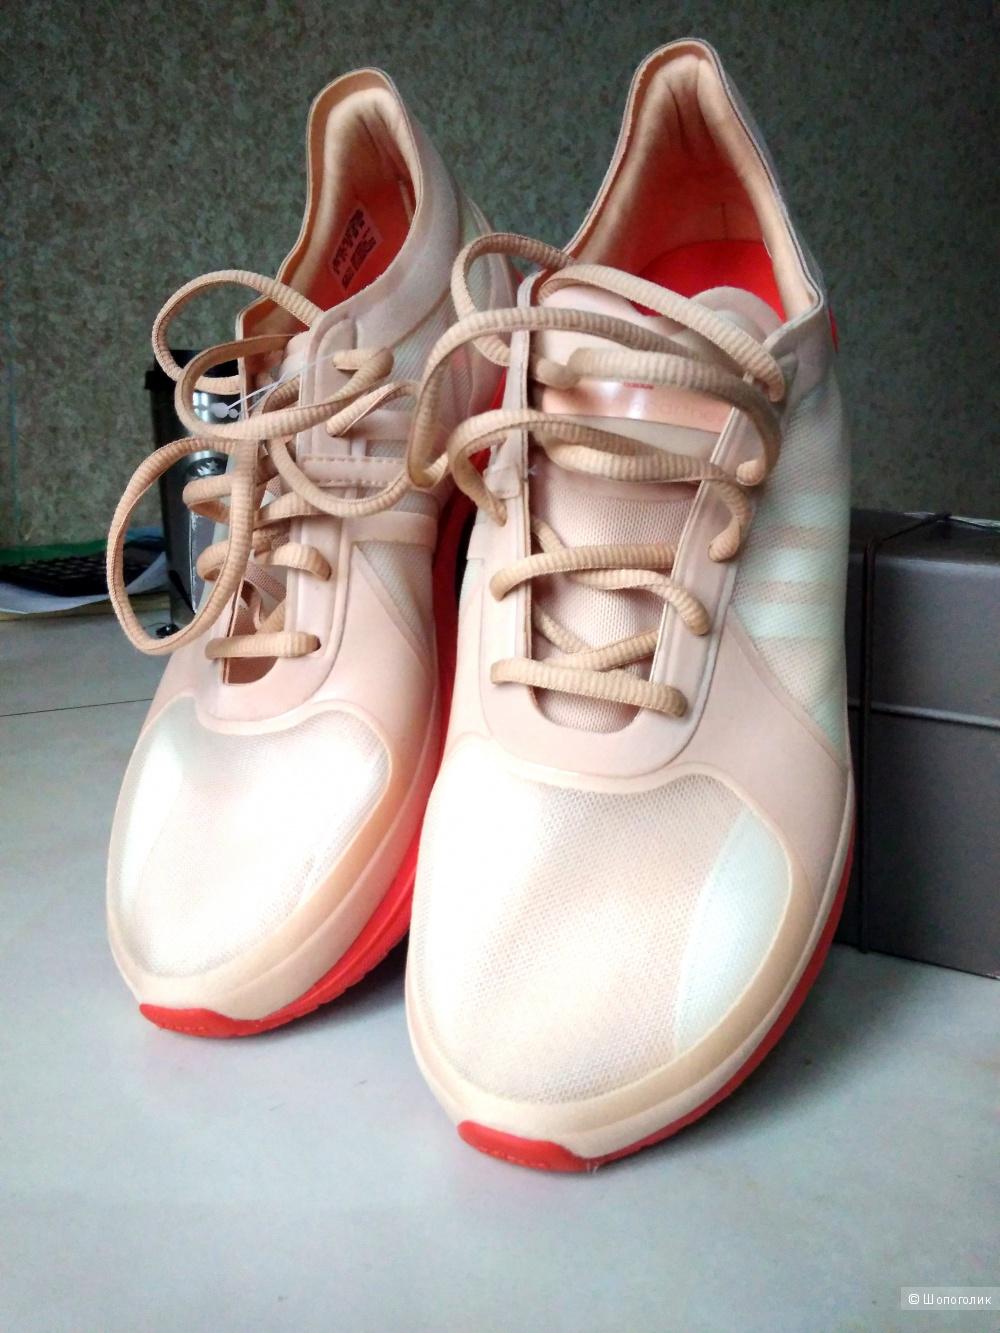 Кроссовки Stella Mccartney For Adidas Diorite Boost размер 39-40